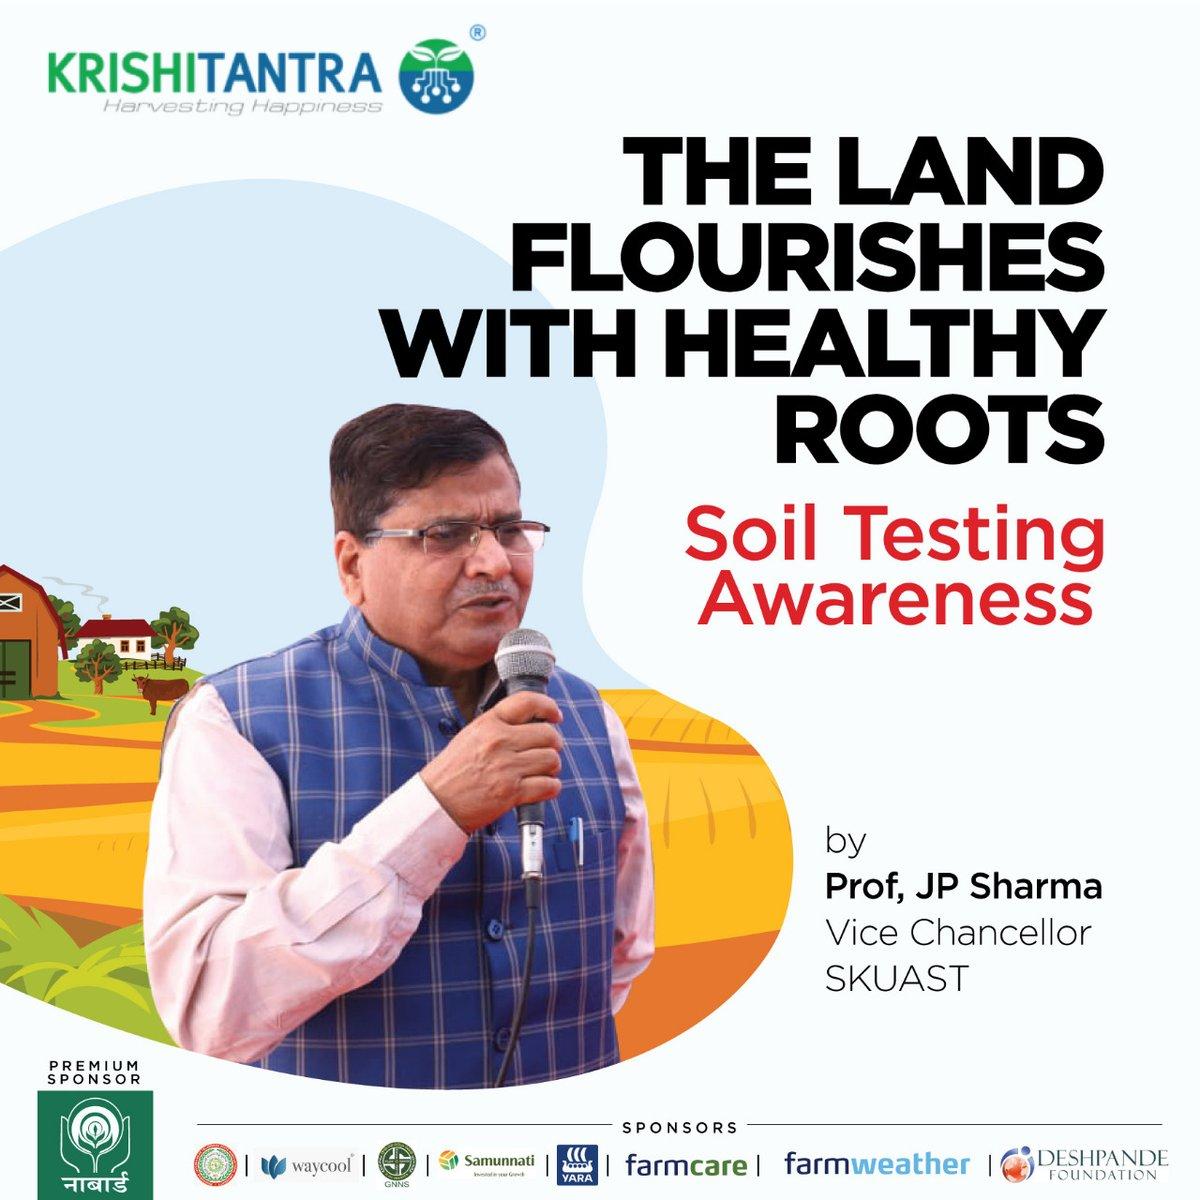 Krishitantra had the honor of hosting Professor JP Sharma, Vice-Chancellor SKUAST to spread awareness on soil testing  to support farmers. To know more, visit  #soiltestingawareness #soiltesting #awarenesscampaign #farmers #greenindia #FarmersFirst